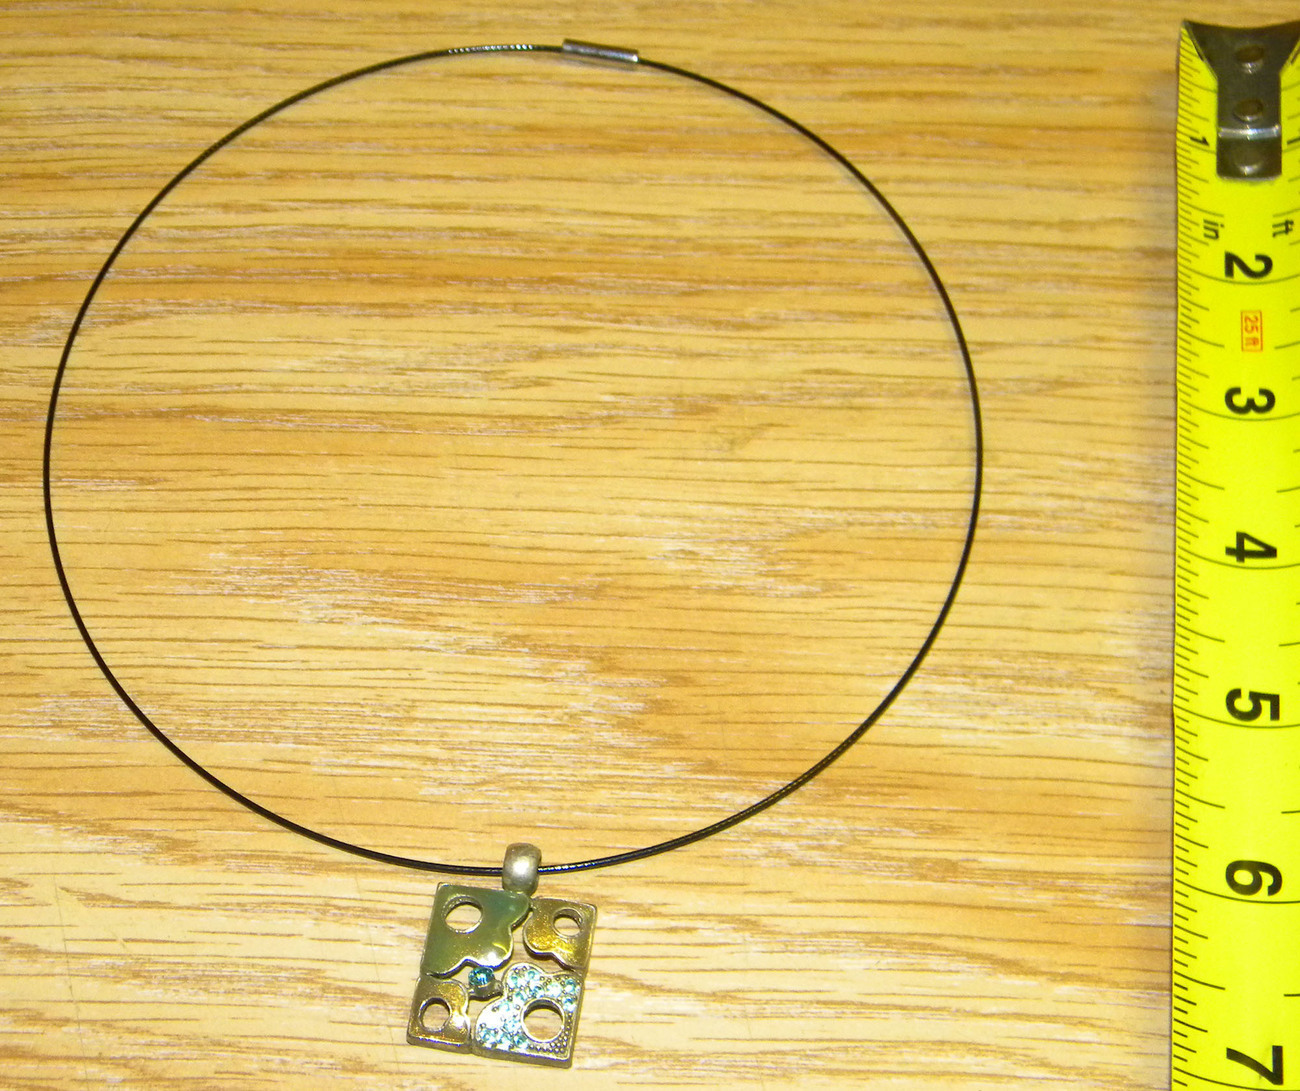 5 necklace choker style